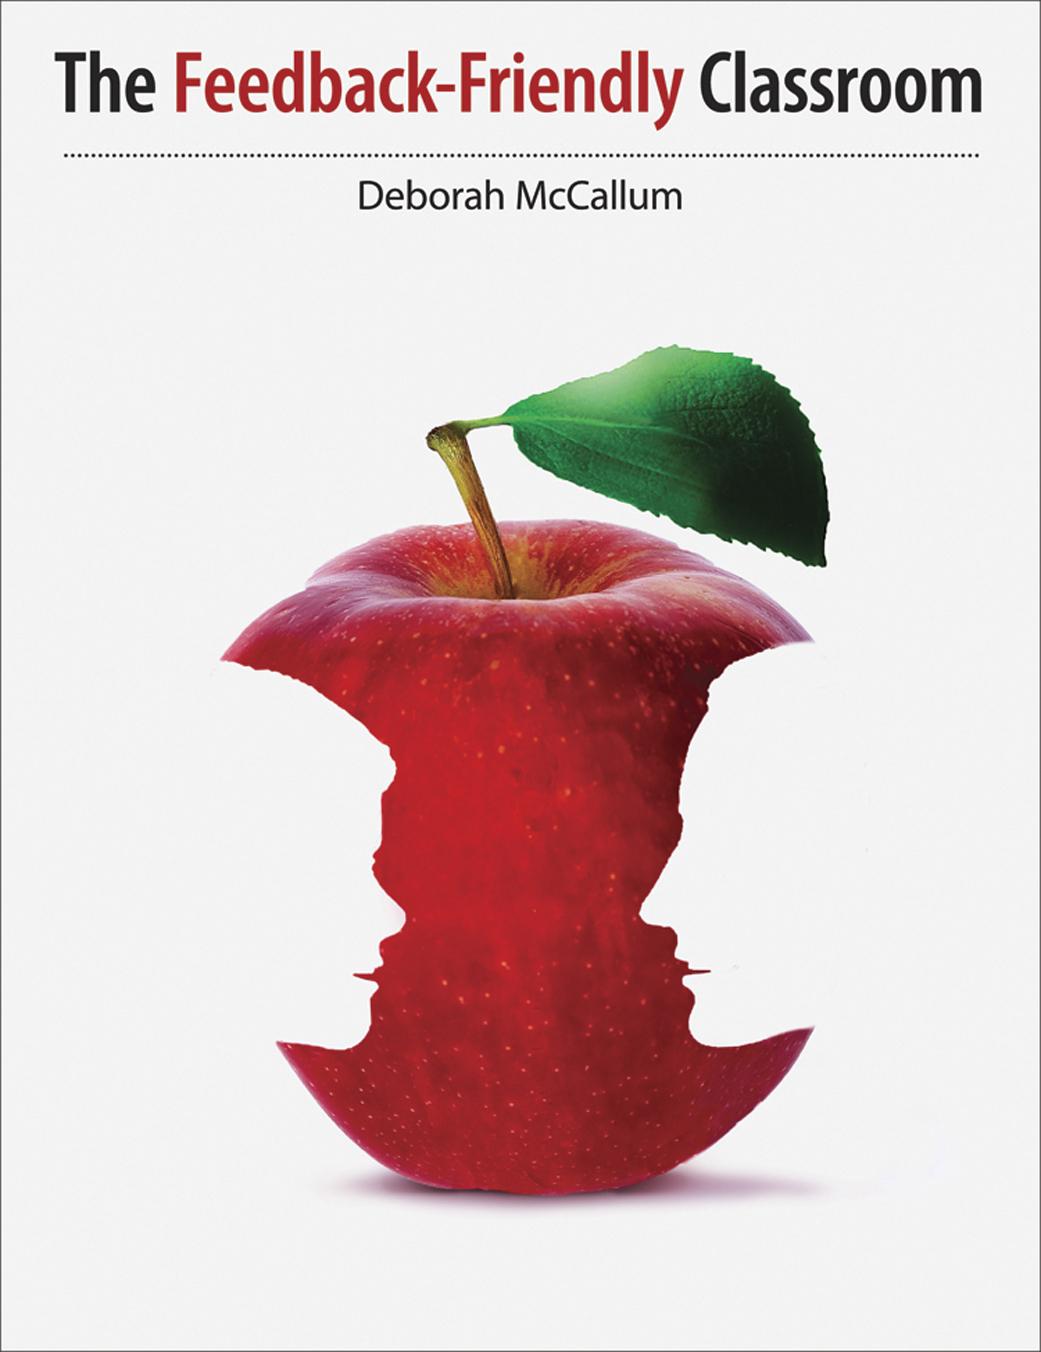 The Feedback-Friendly Classroom Deborah McCallum